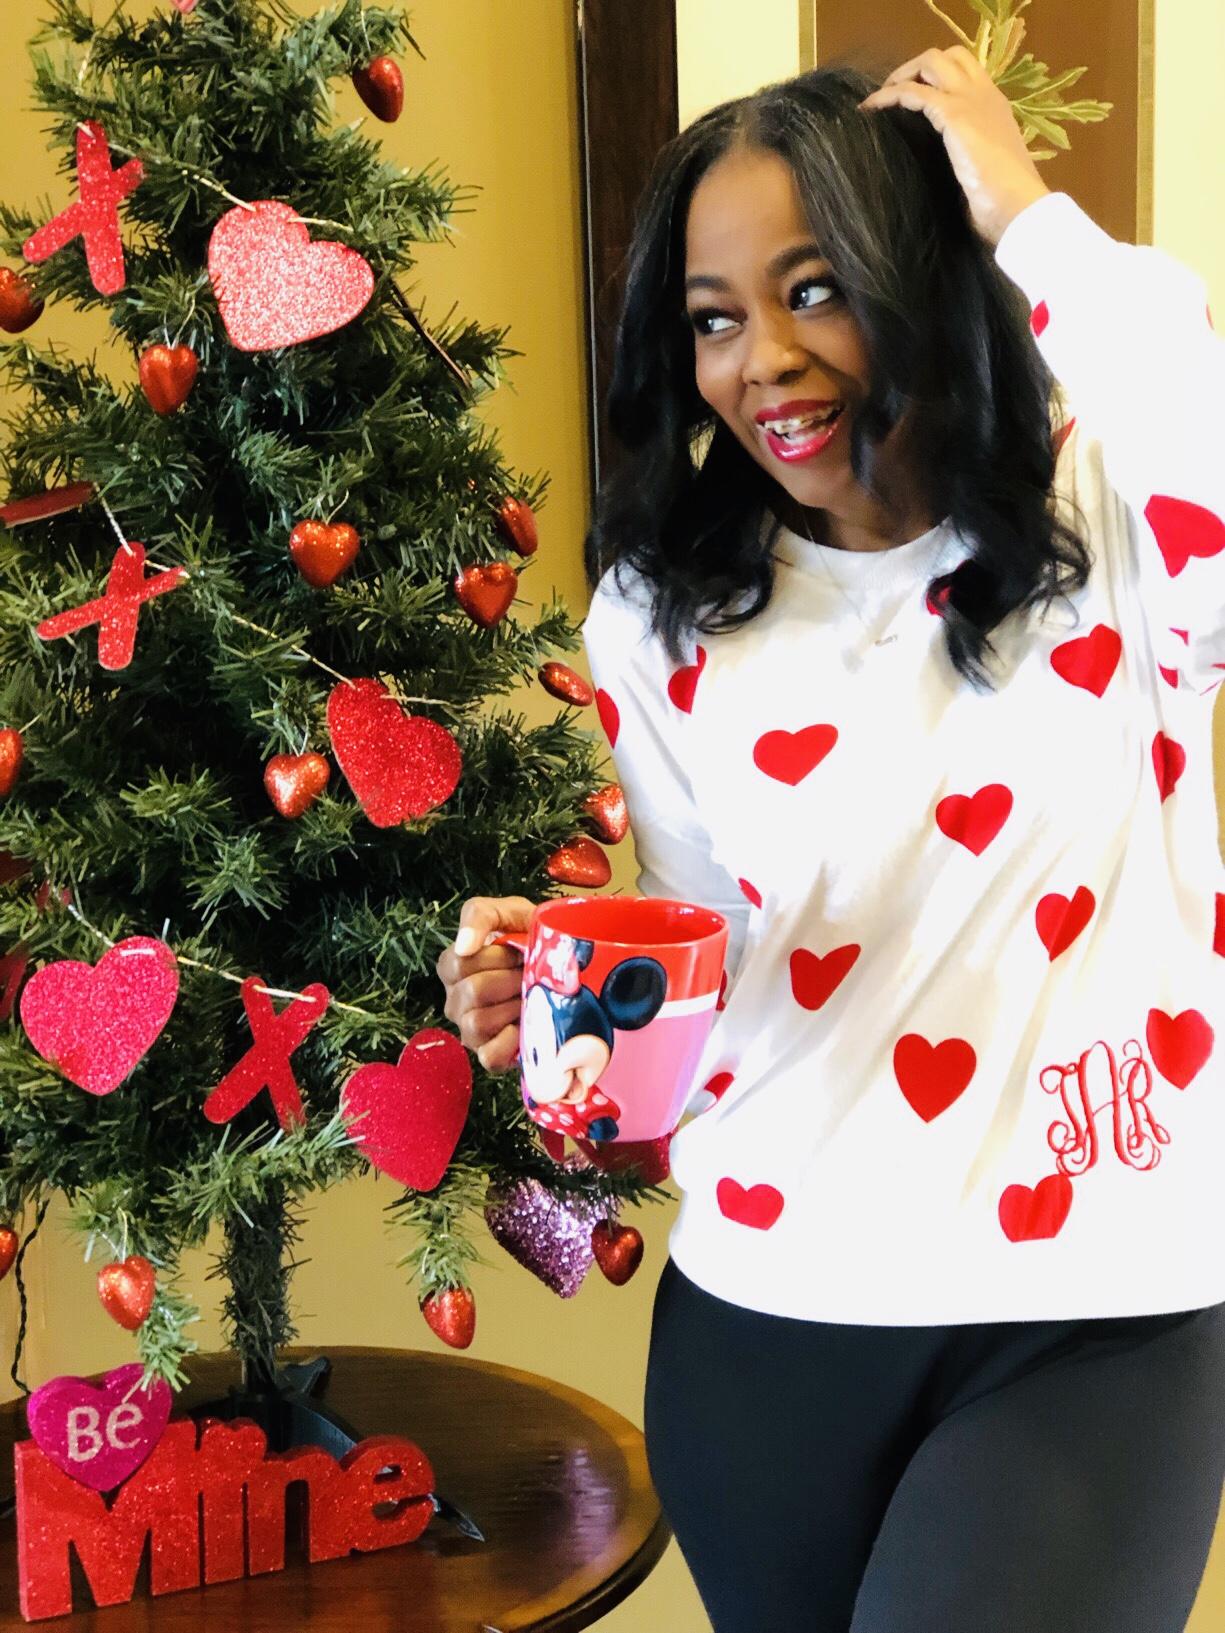 My Style: I Love Jewelry Valentine's Day Themed MonoBox Monogrammed Sweater